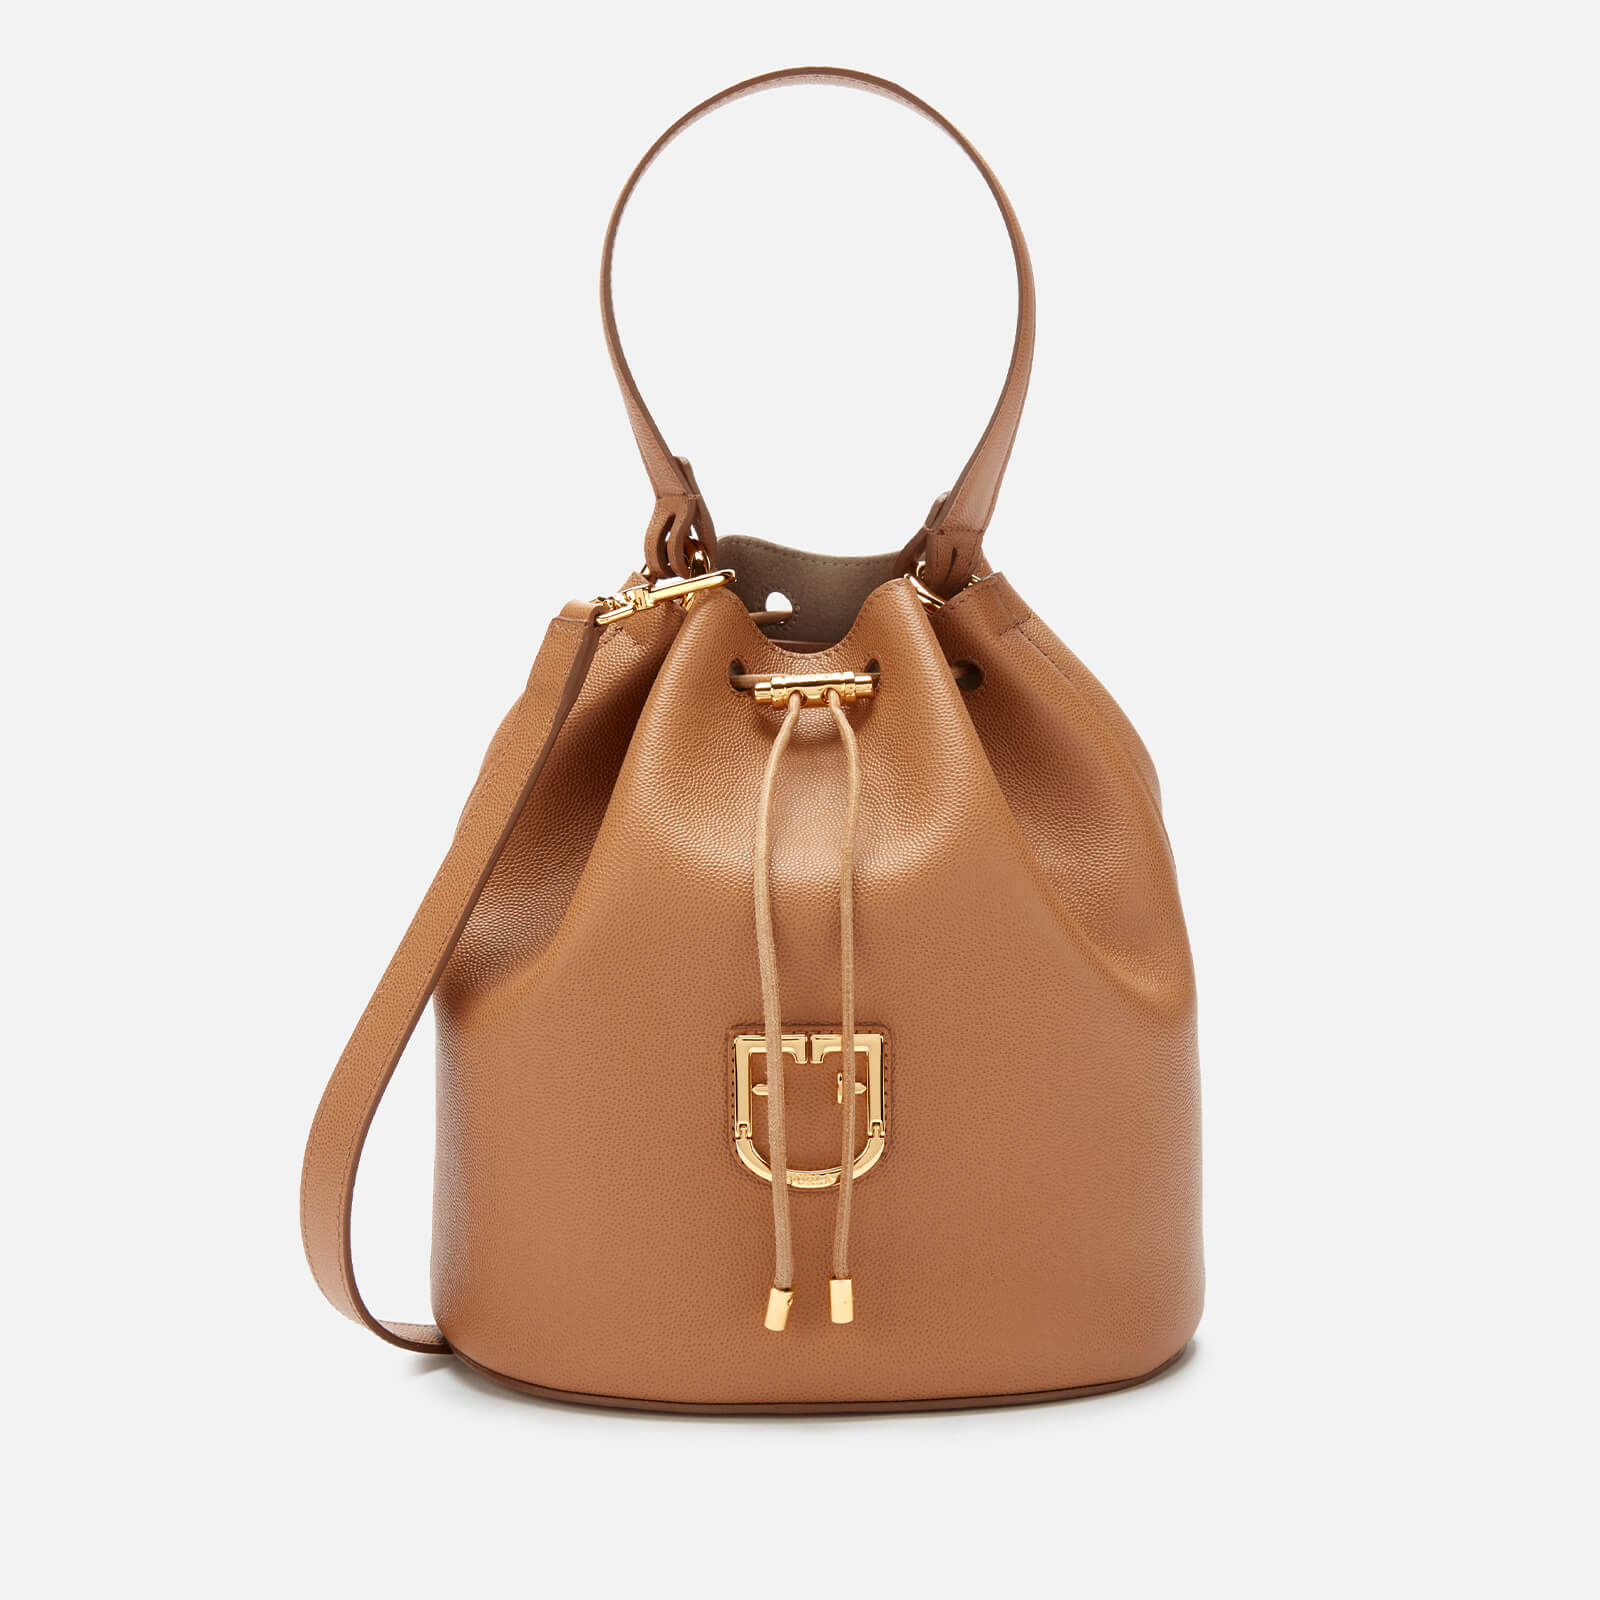 Furla Women's Corona S Drawstring Bag - Caramello F